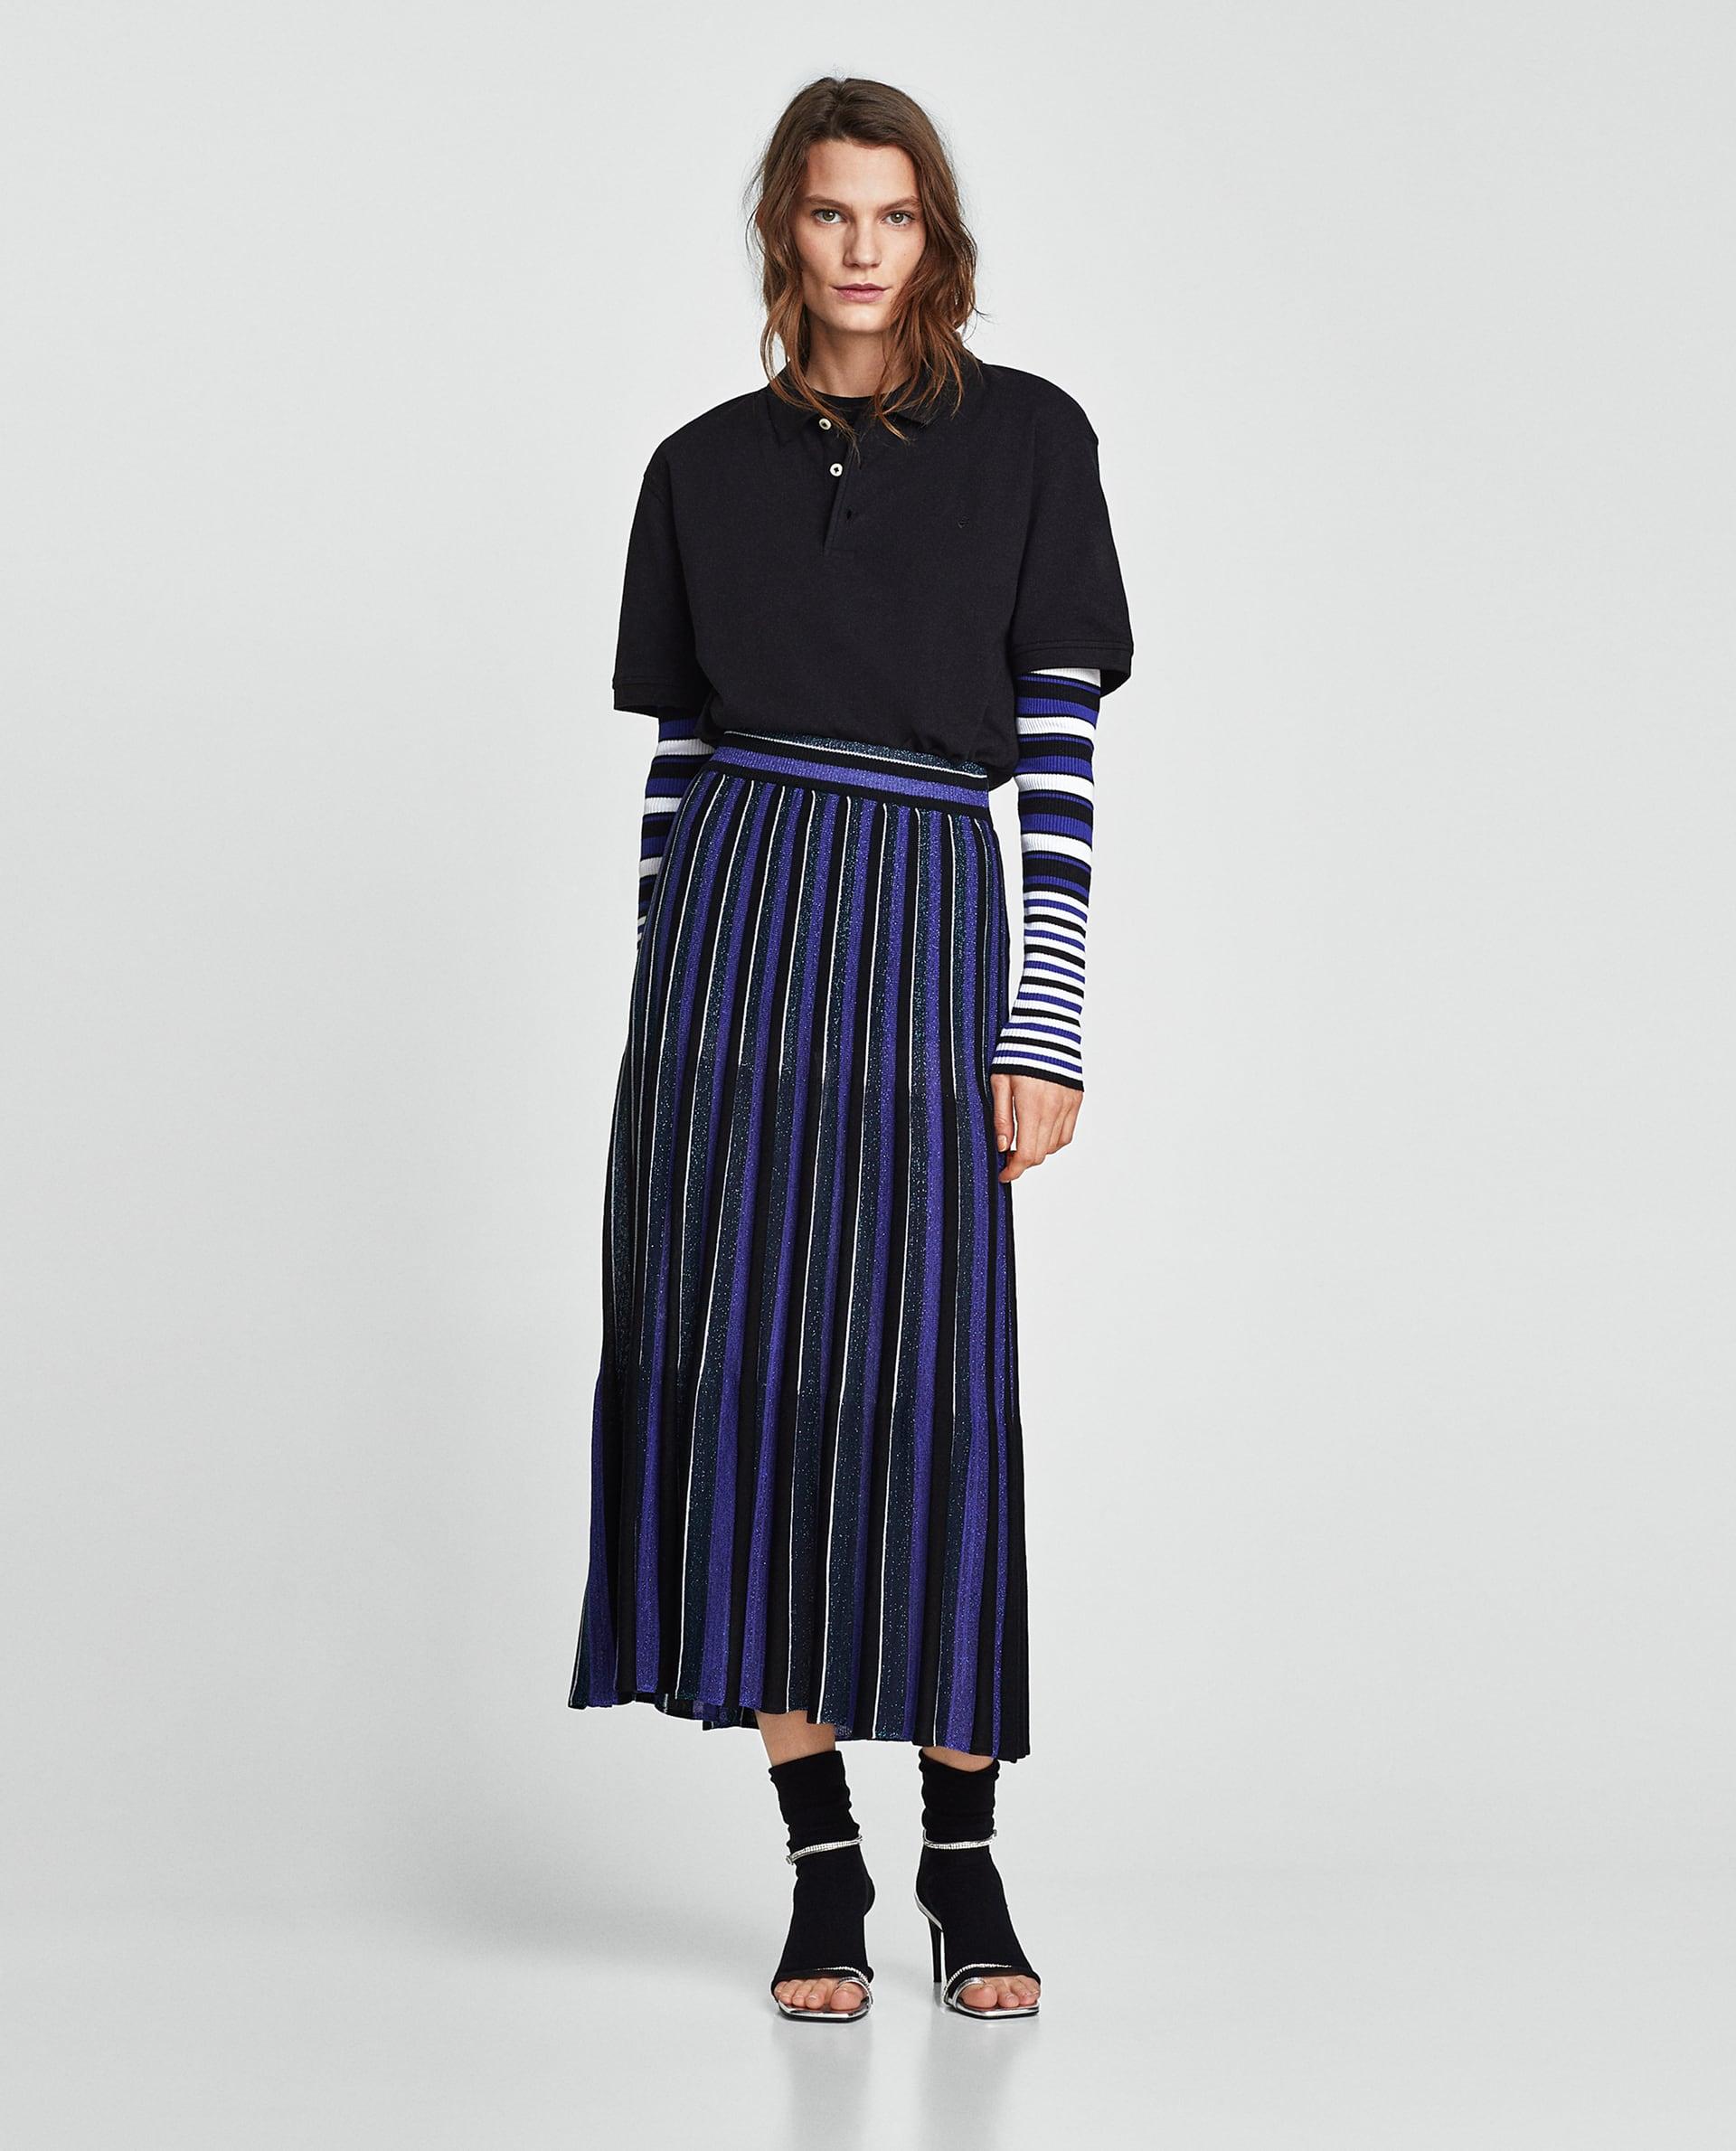 Gonna lungha plissè Zara collezione primavera estate 2018